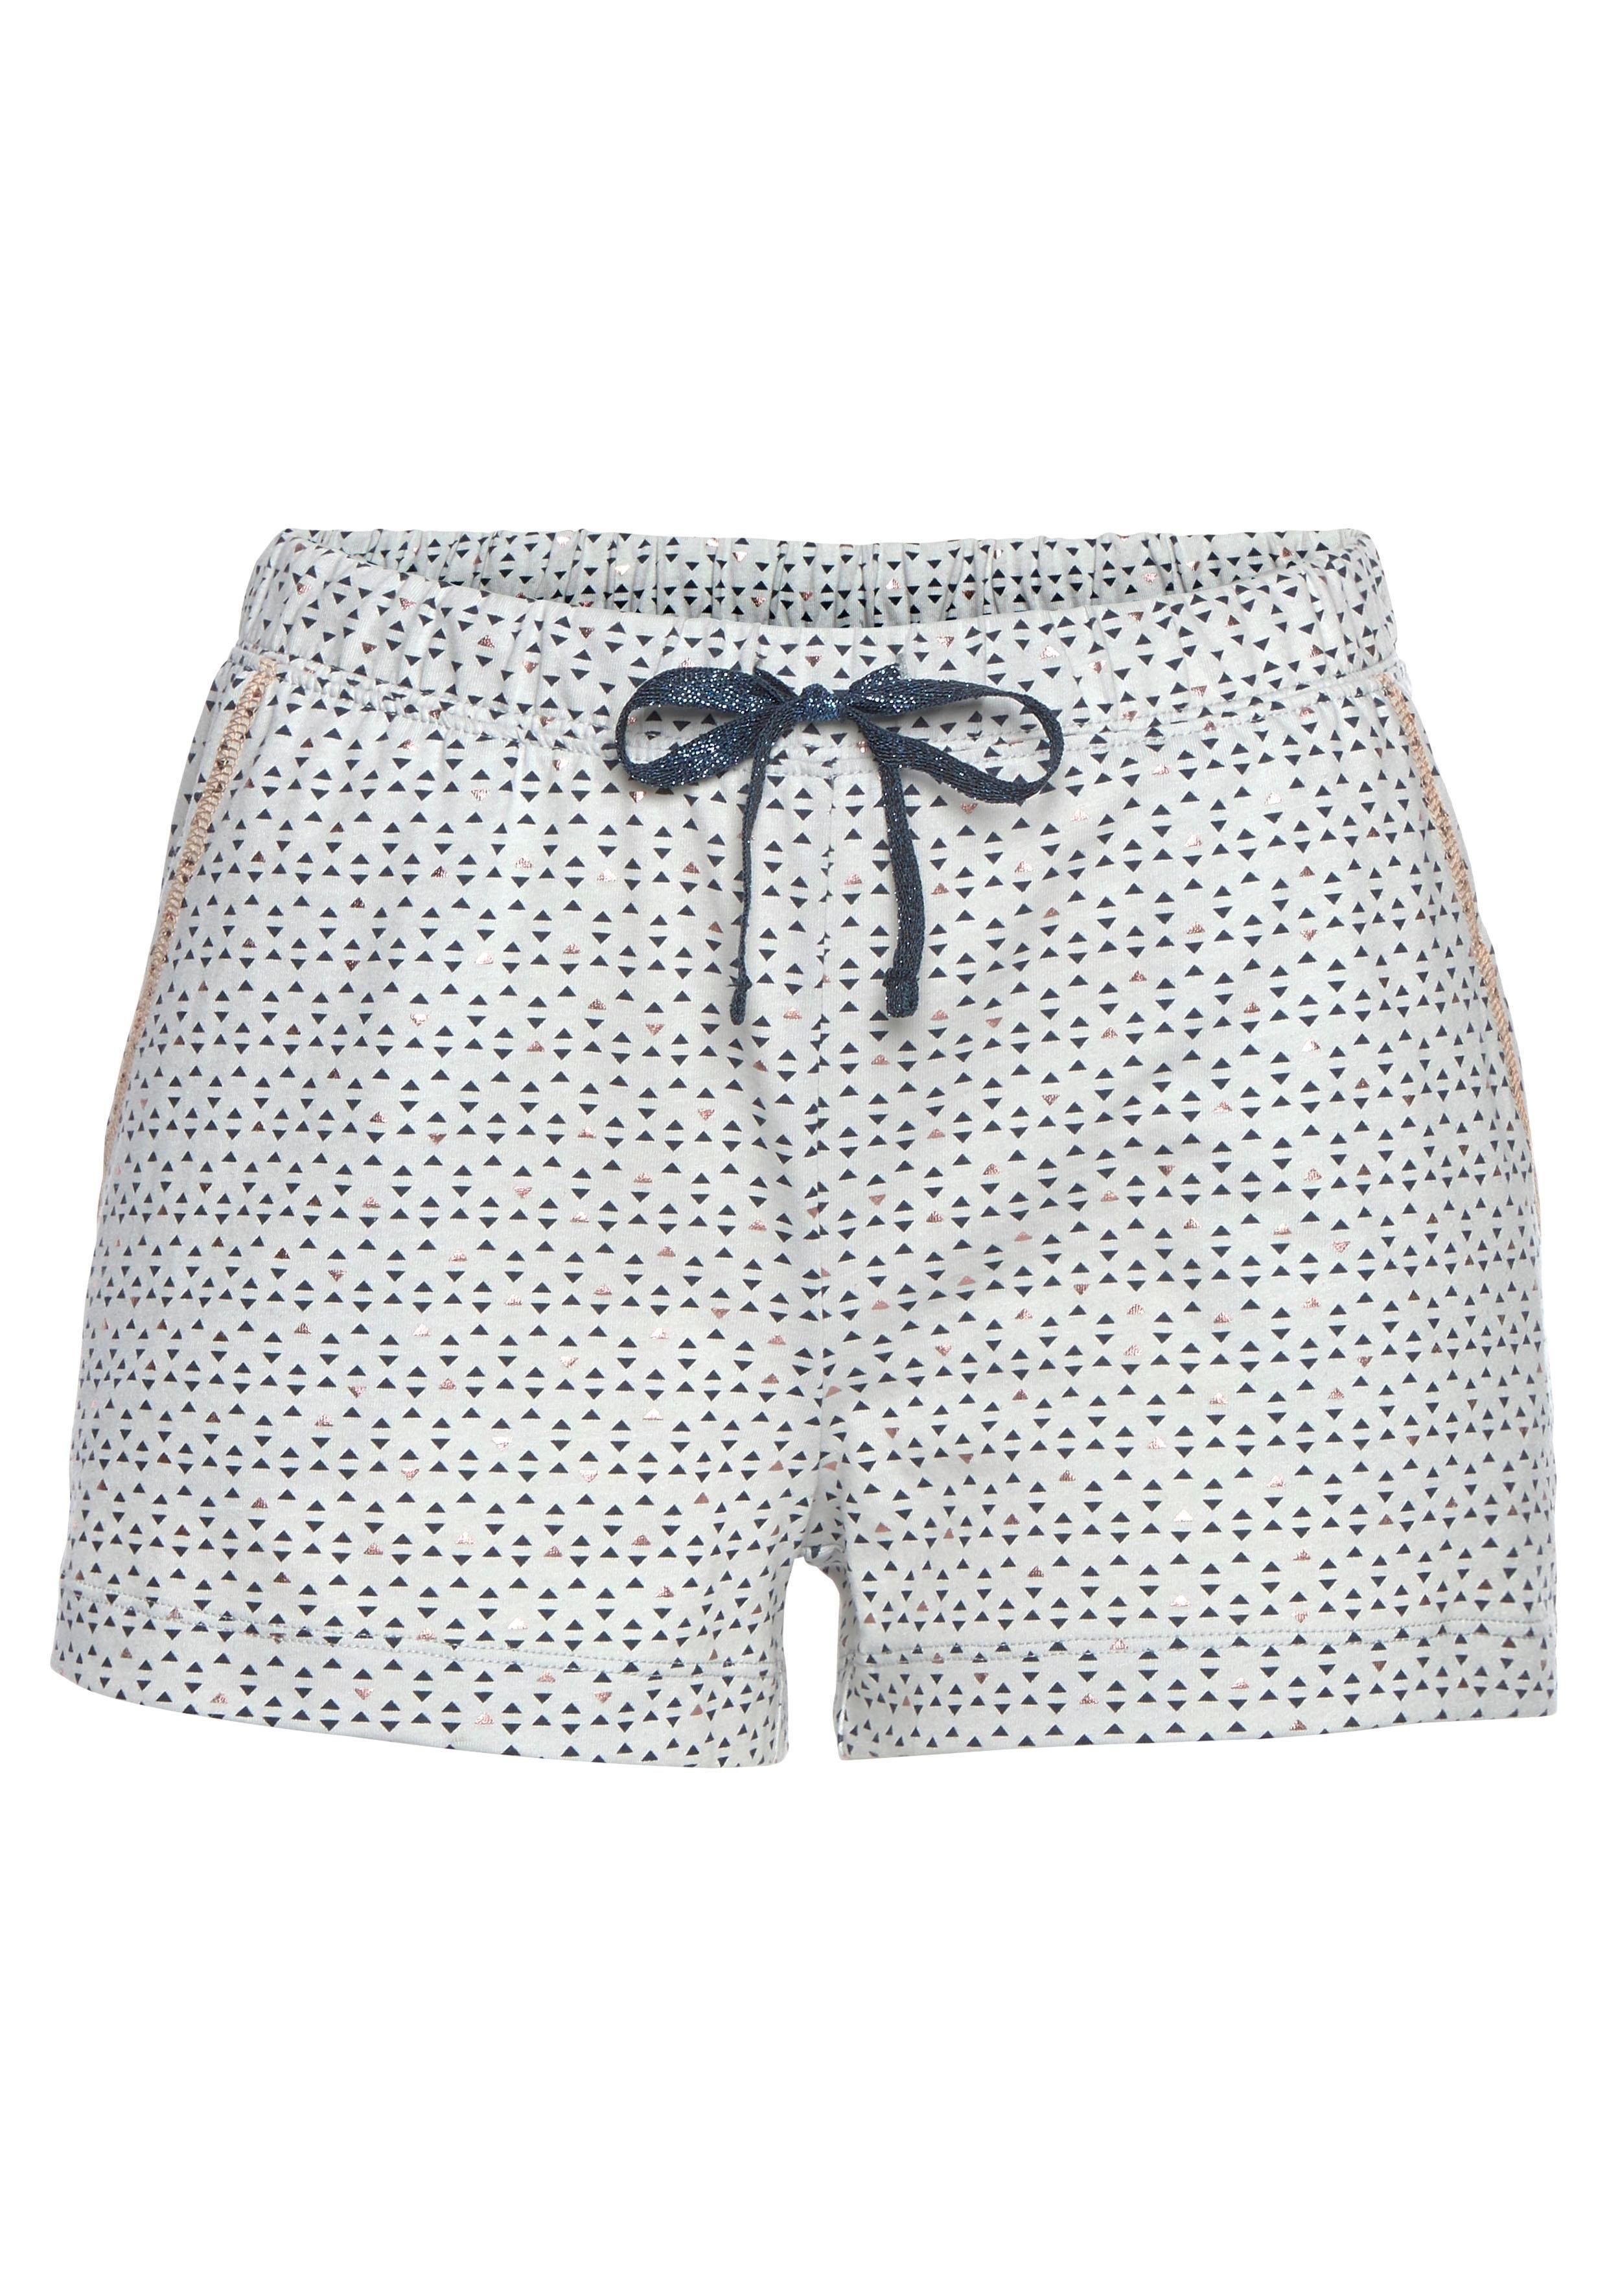 Vivance Collection Vivance Dreams pyjamashort goedkoop op lascana.nl kopen